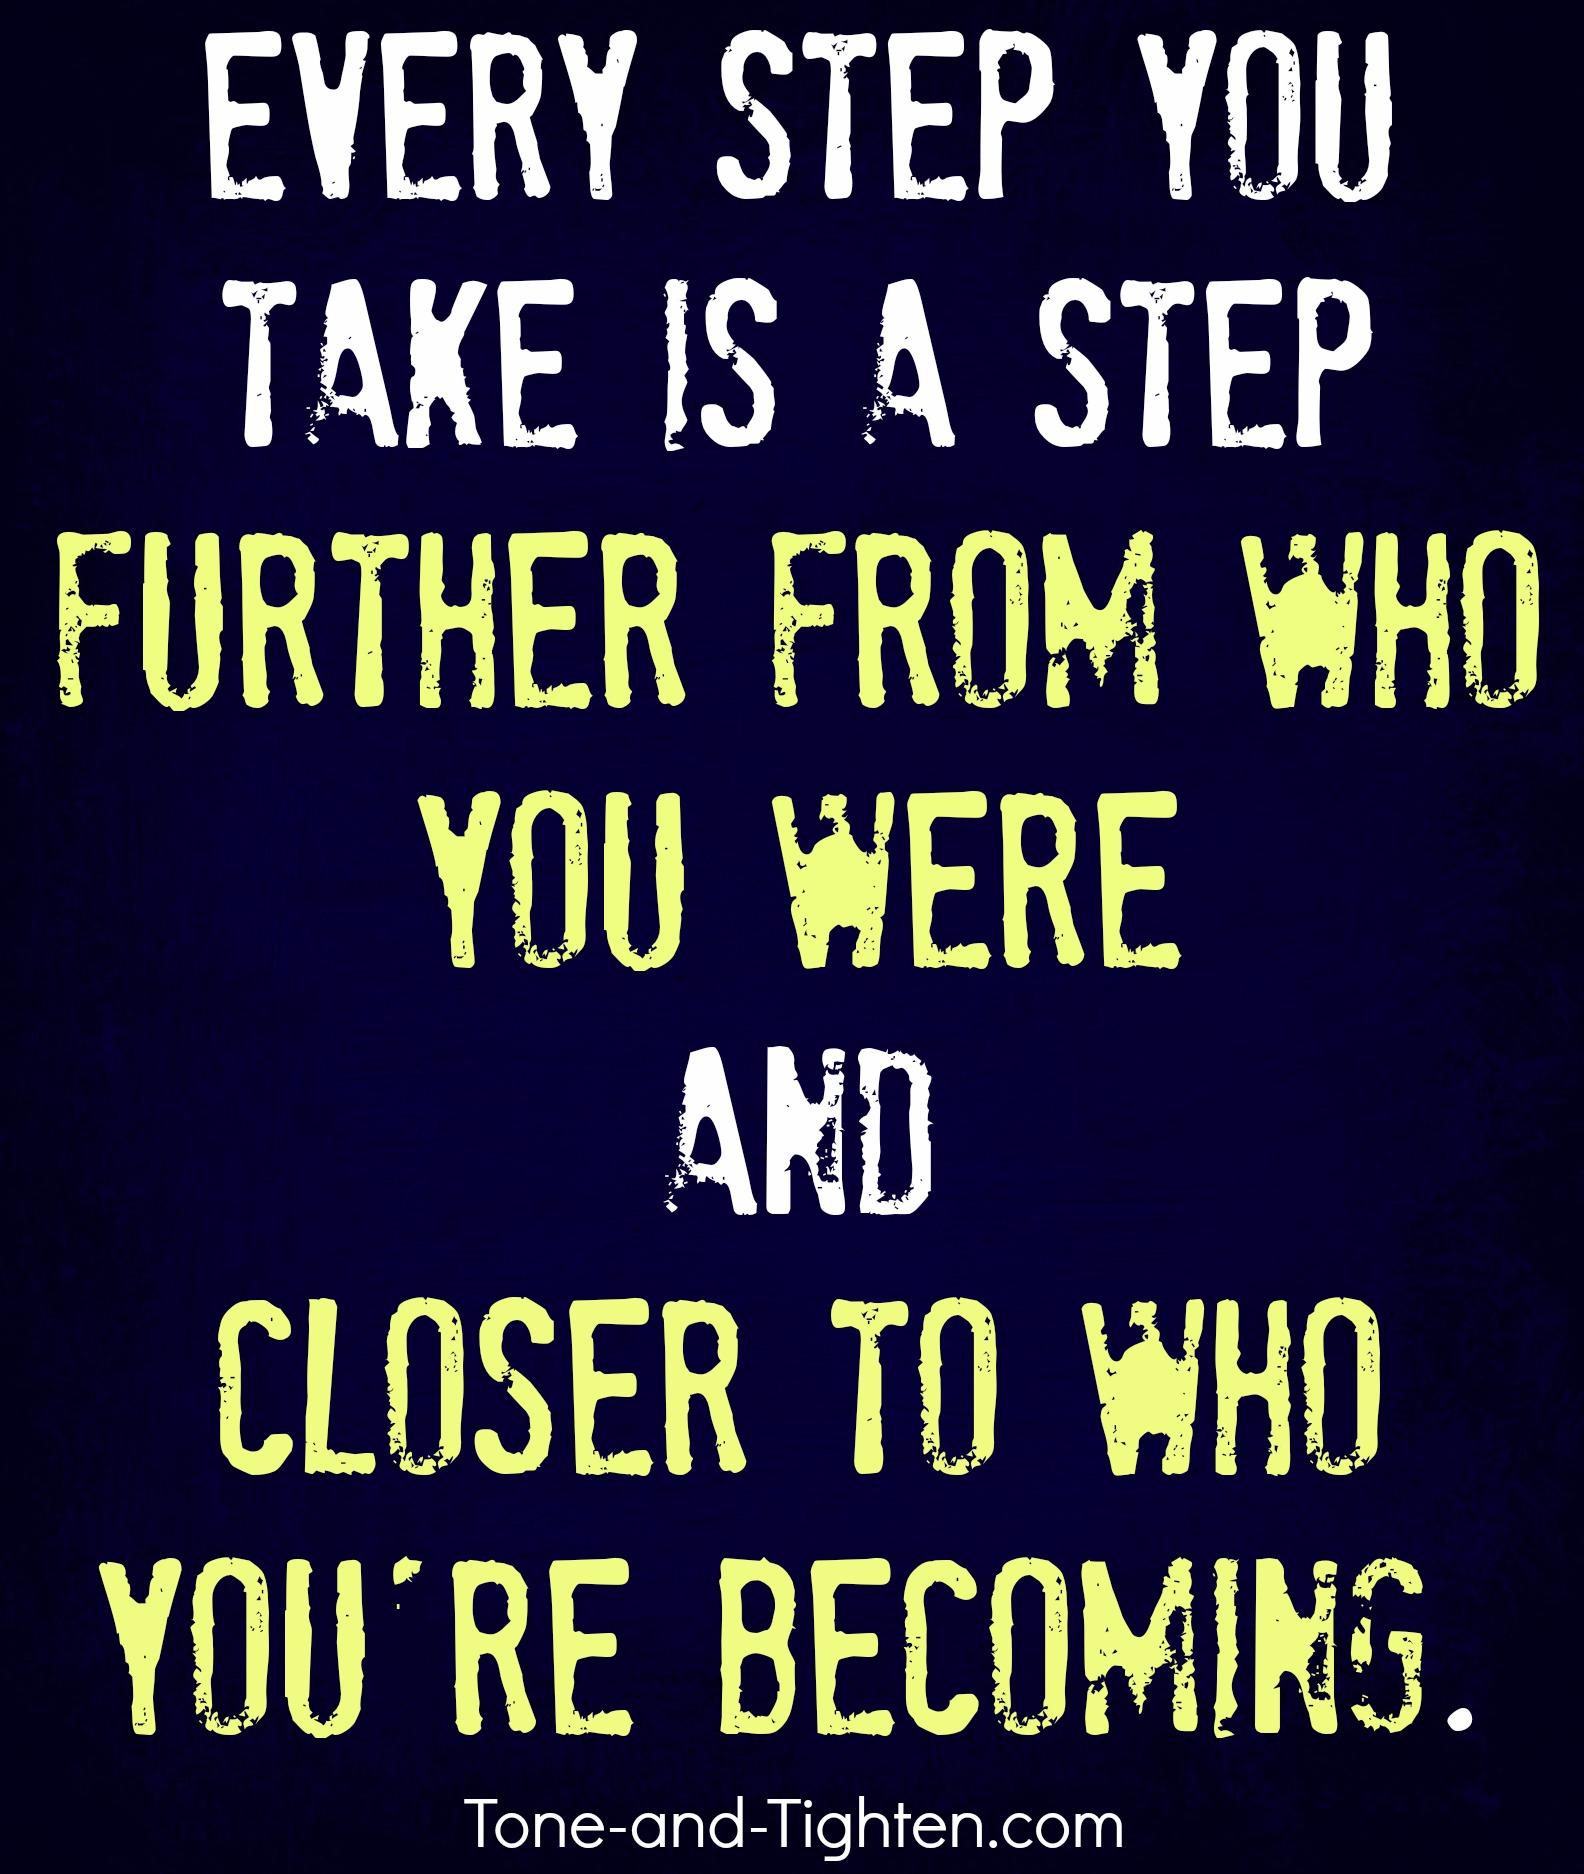 Inspirational Day Quotes: Circuit Training Quotes Motivation. QuotesGram